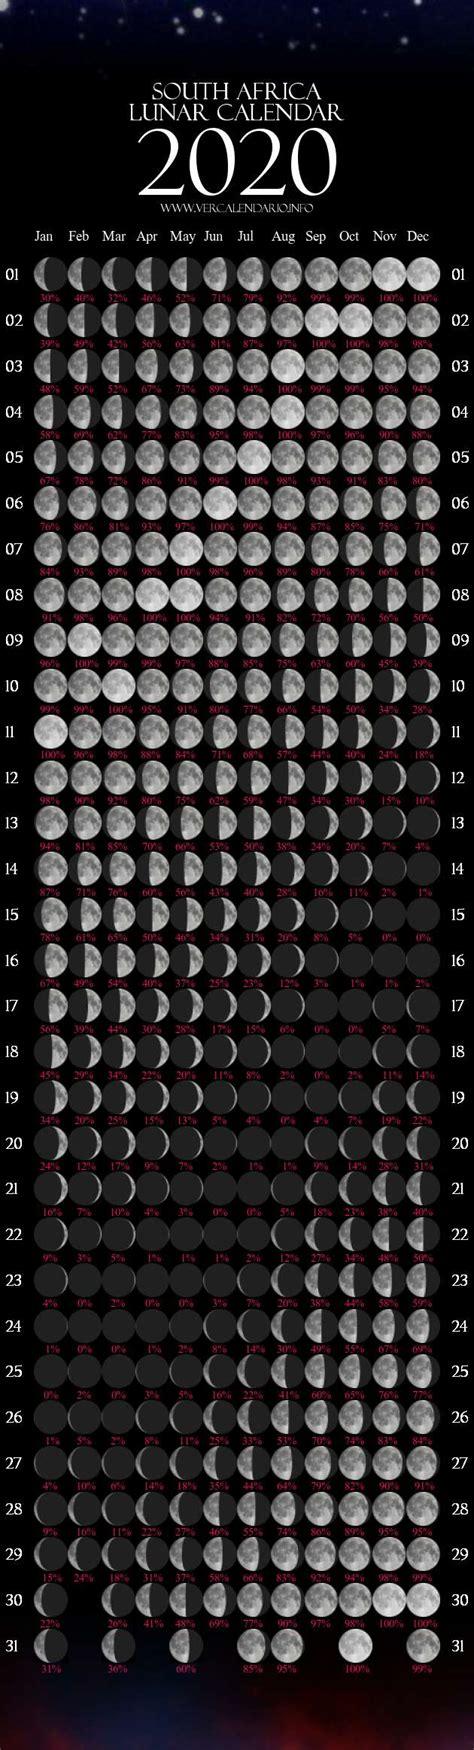 lunar calendar  south africa